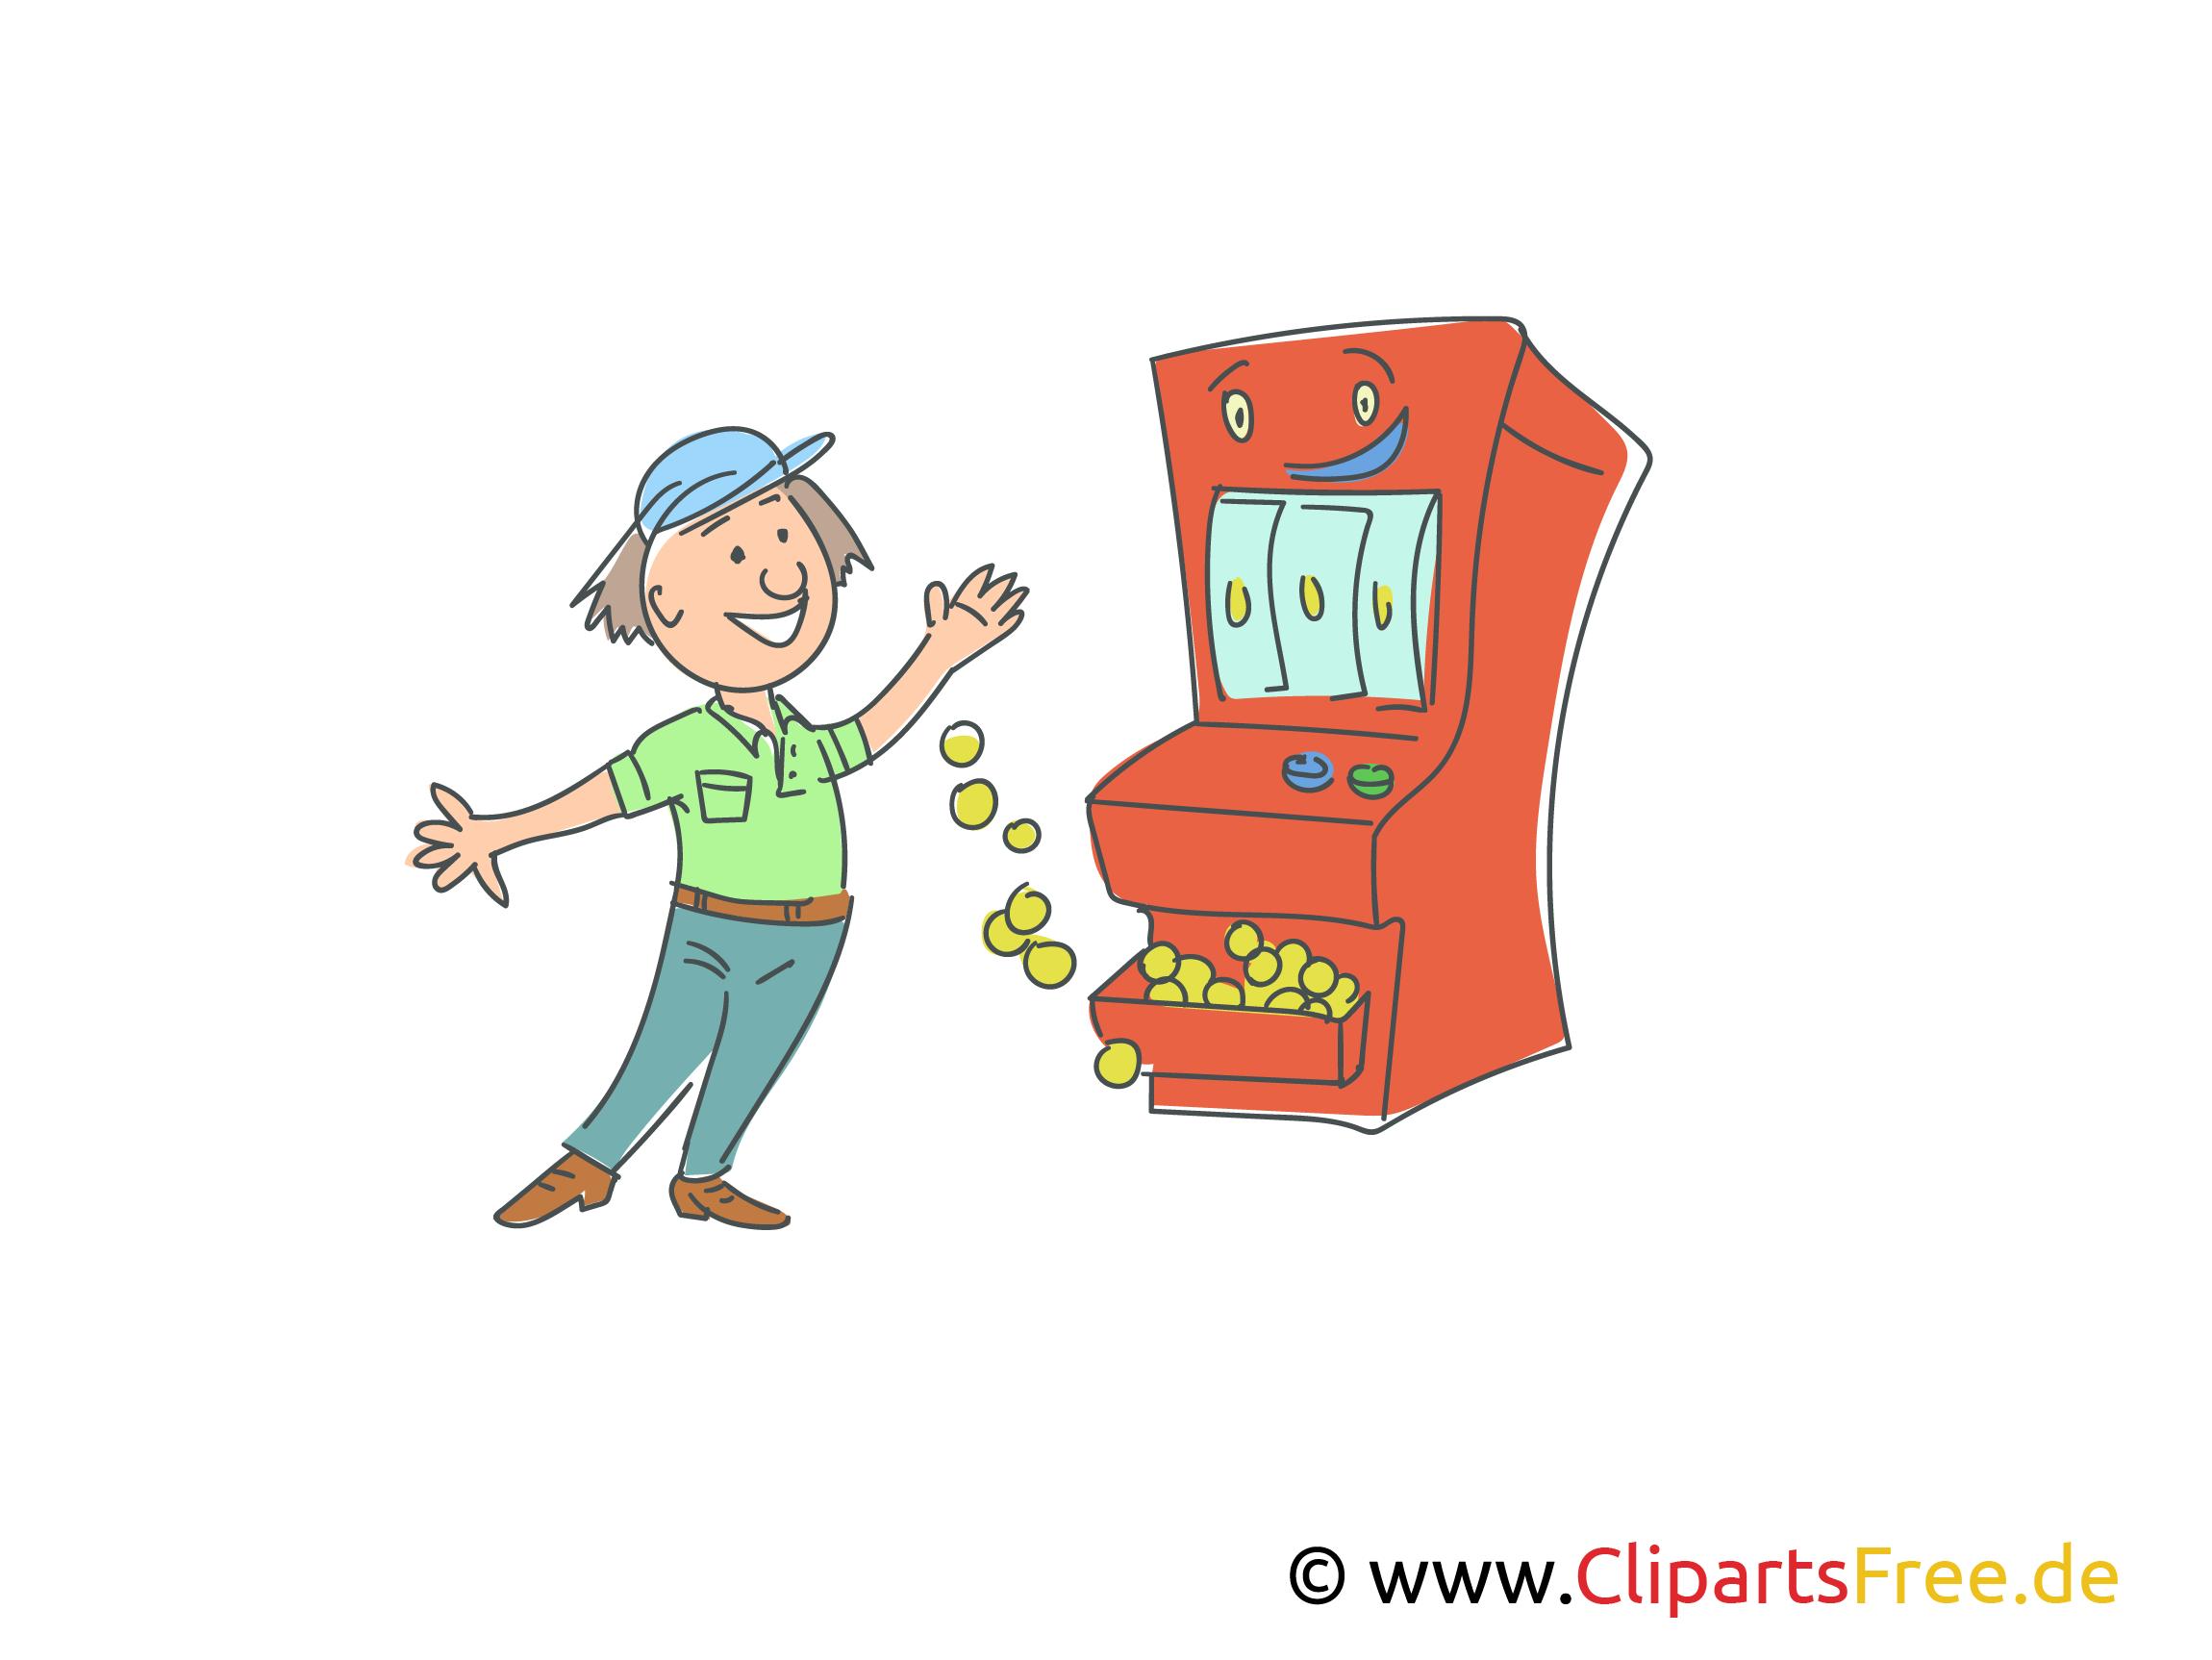 Gewinn bei Spielautomaten Bild, Illustration, Clipart